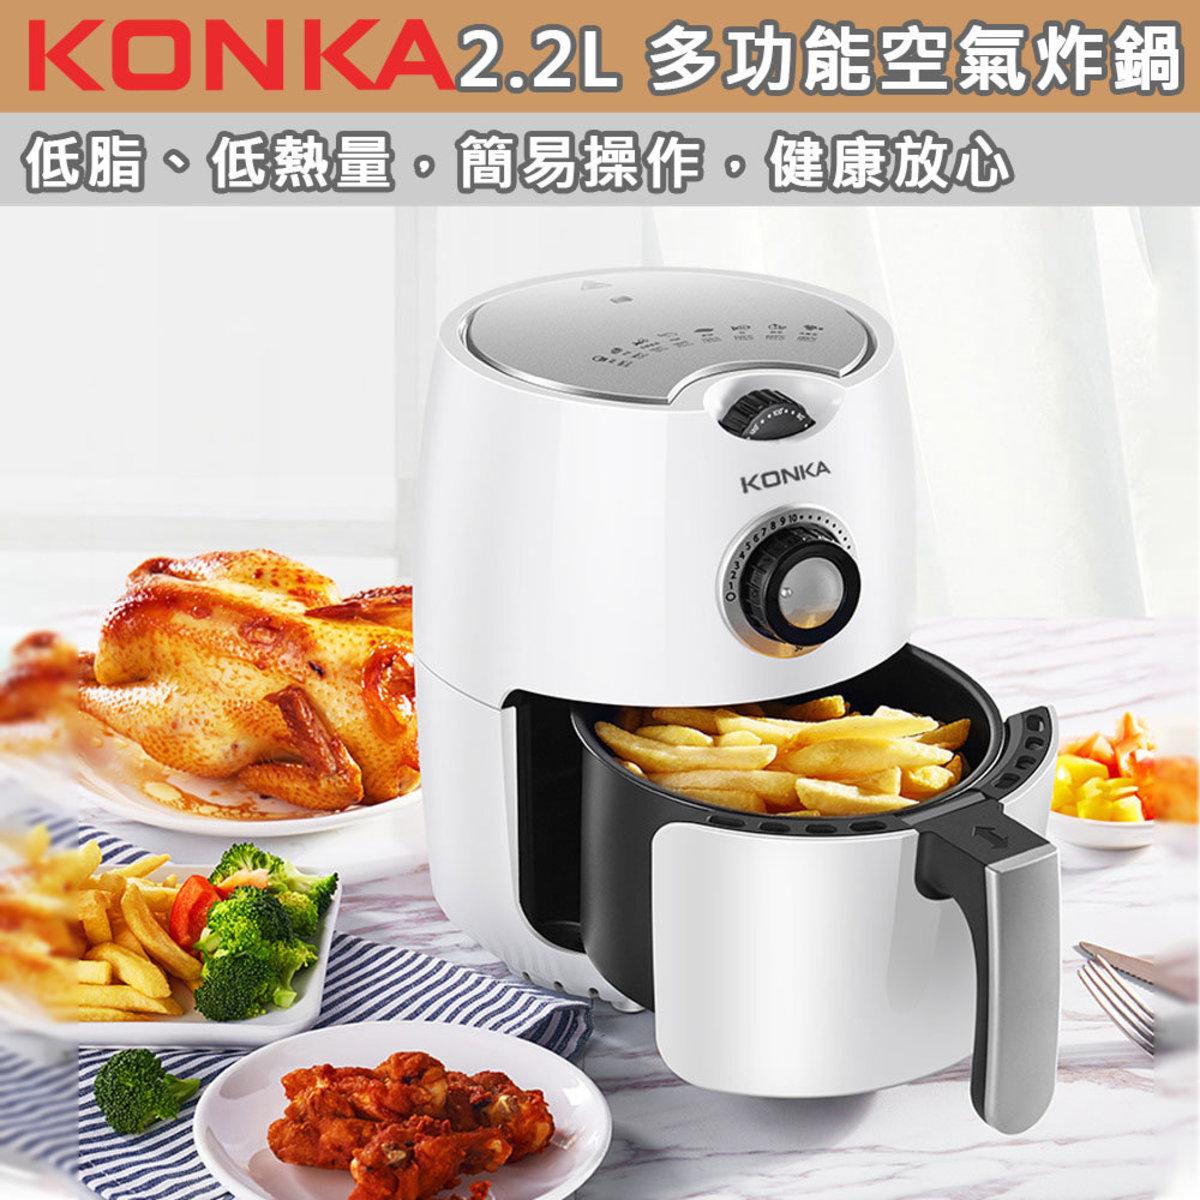 2.2L 多功能空氣炸鍋 - KGKZ-2202WE (白色) 無油健康 電炸鍋